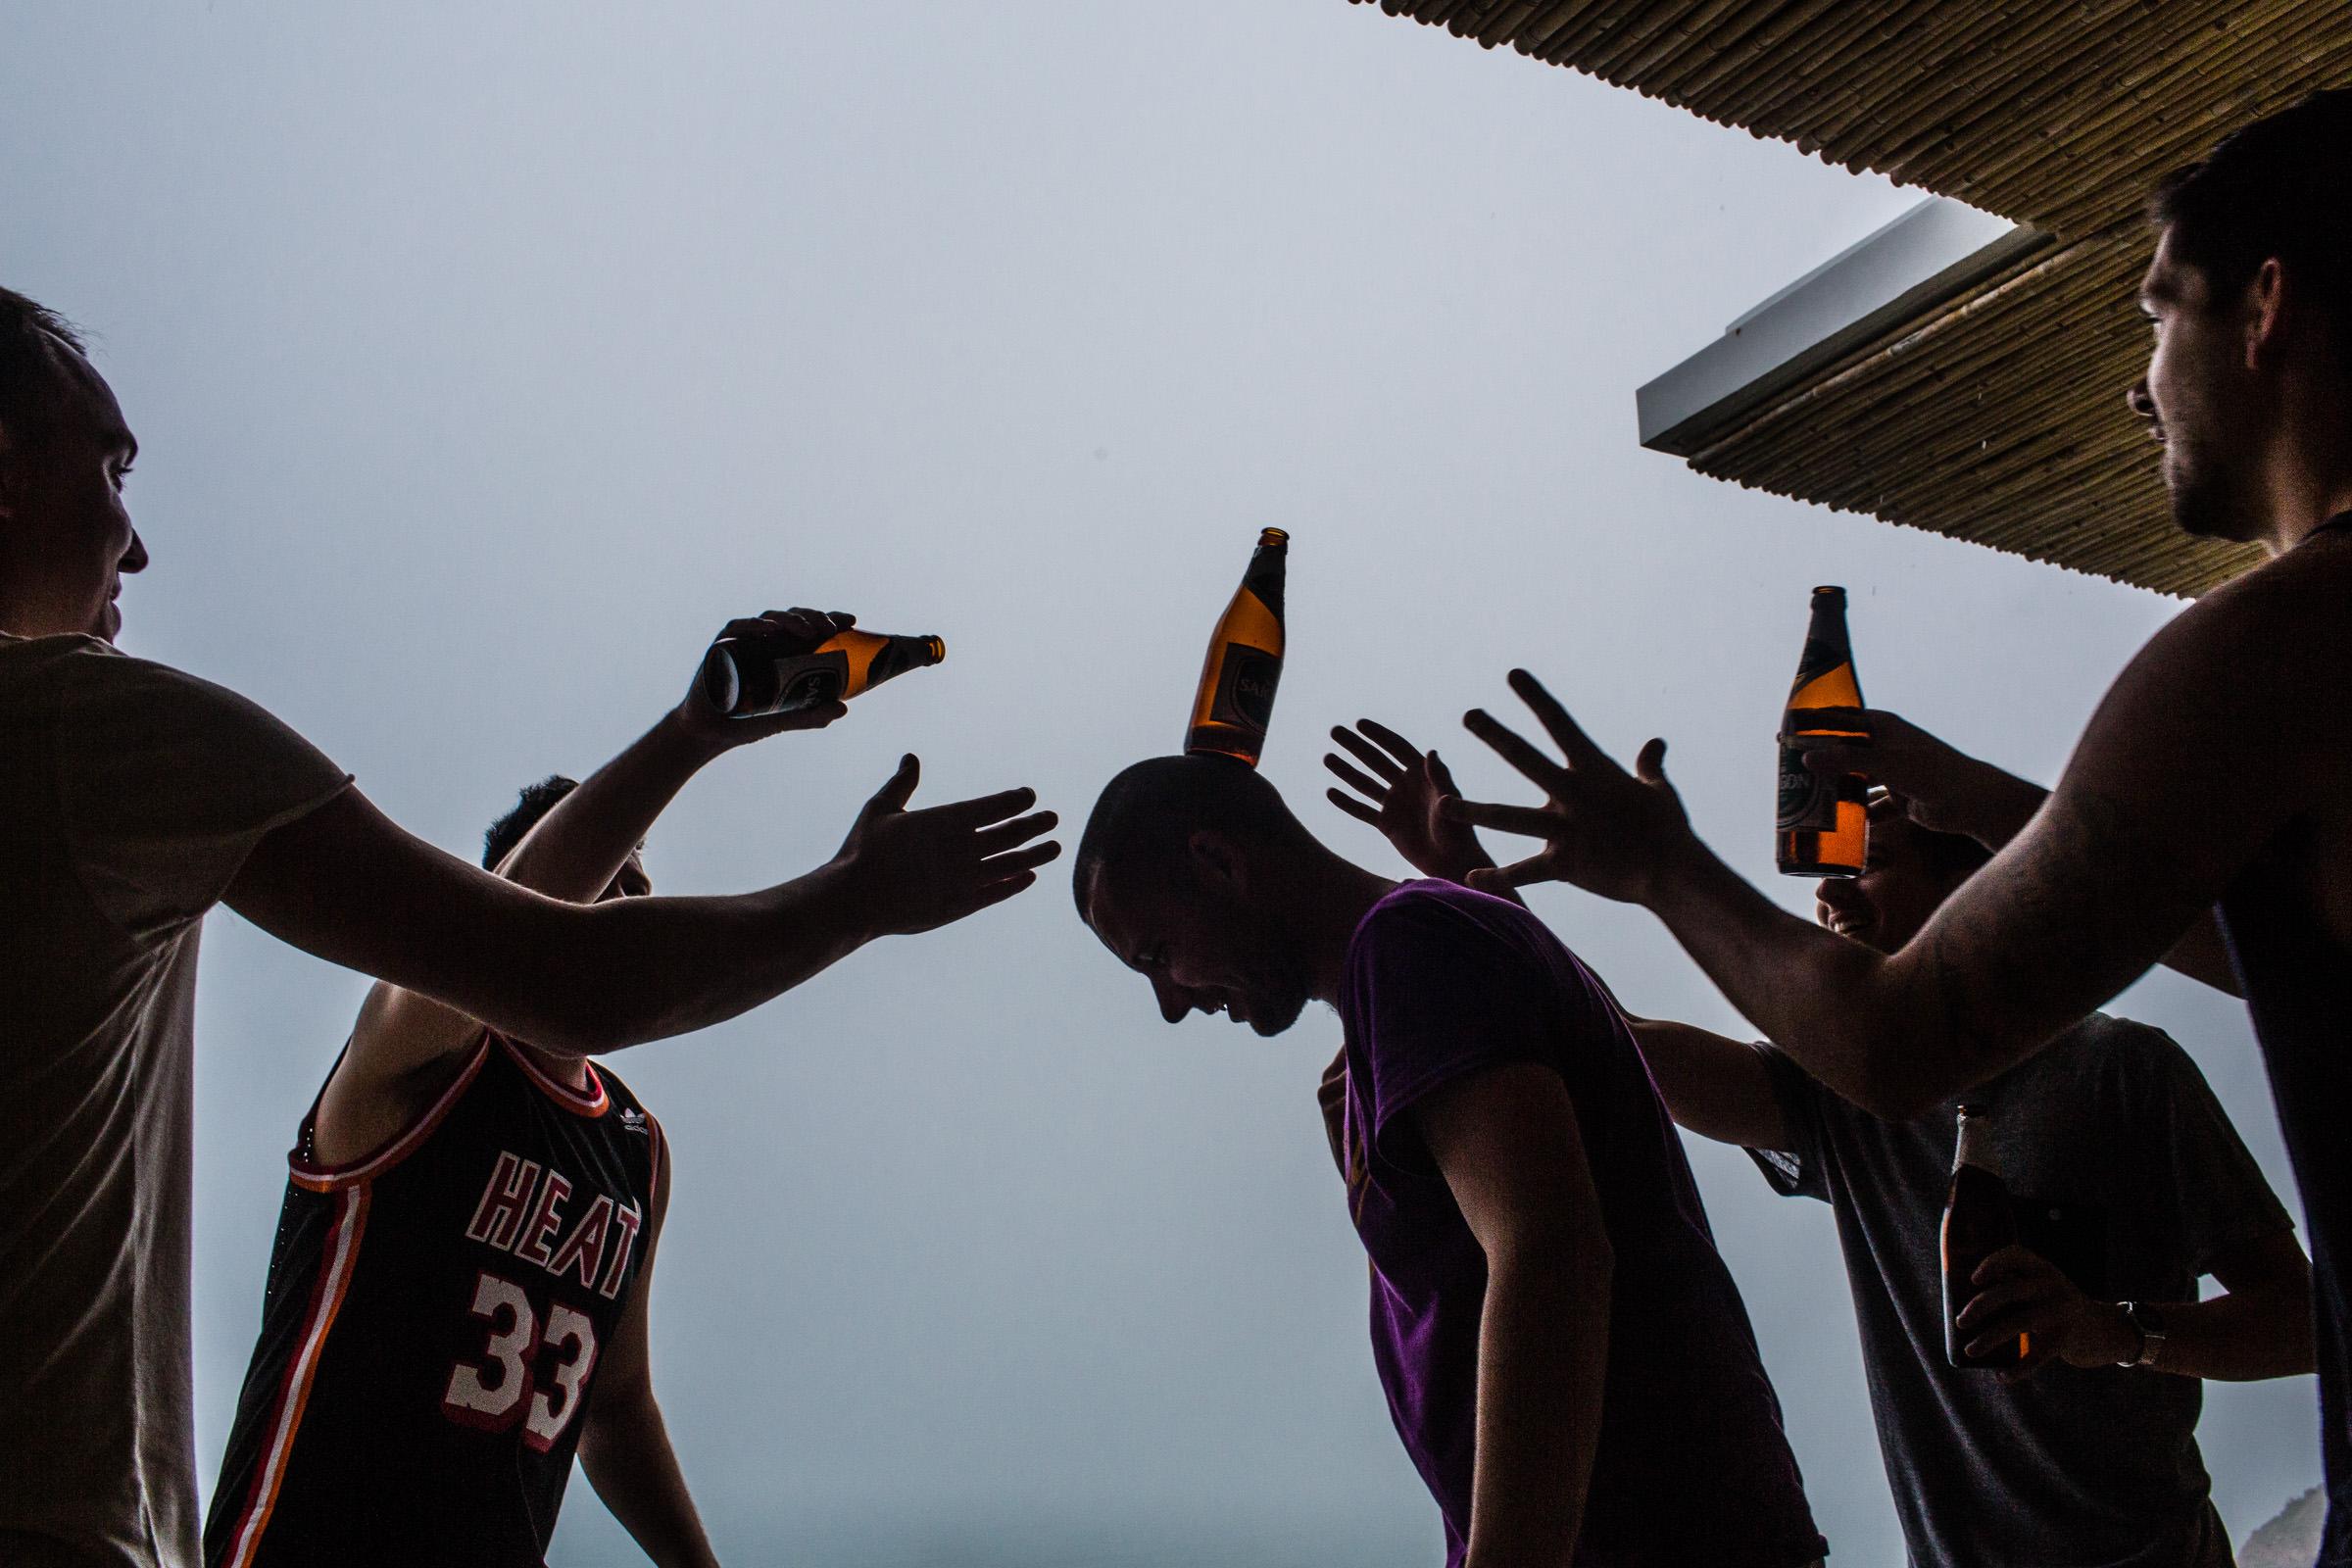 Groomsmen horsing around with beer - Photo by Wainwright Weddings